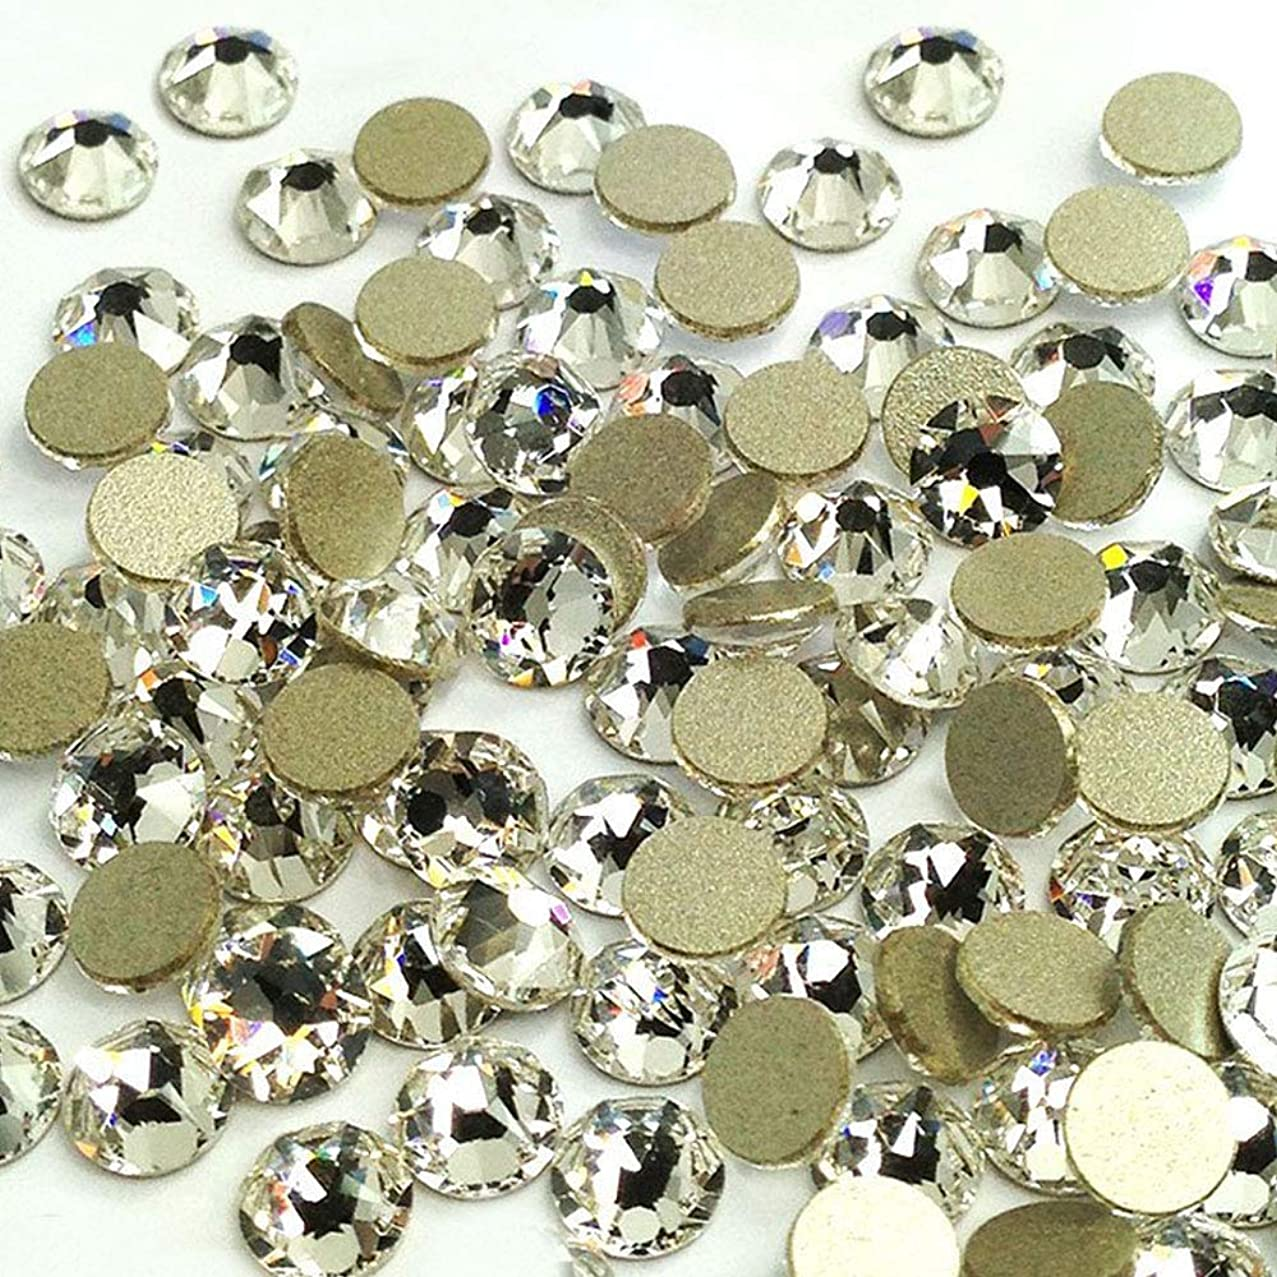 LWCUS 144pcs Crystal Clear Swarovski-Grade No-Hotfix Non-self-Adhesive Flat Back Round Diamante Gem Rhinestones for DIY Crafts Decorating (5mm)